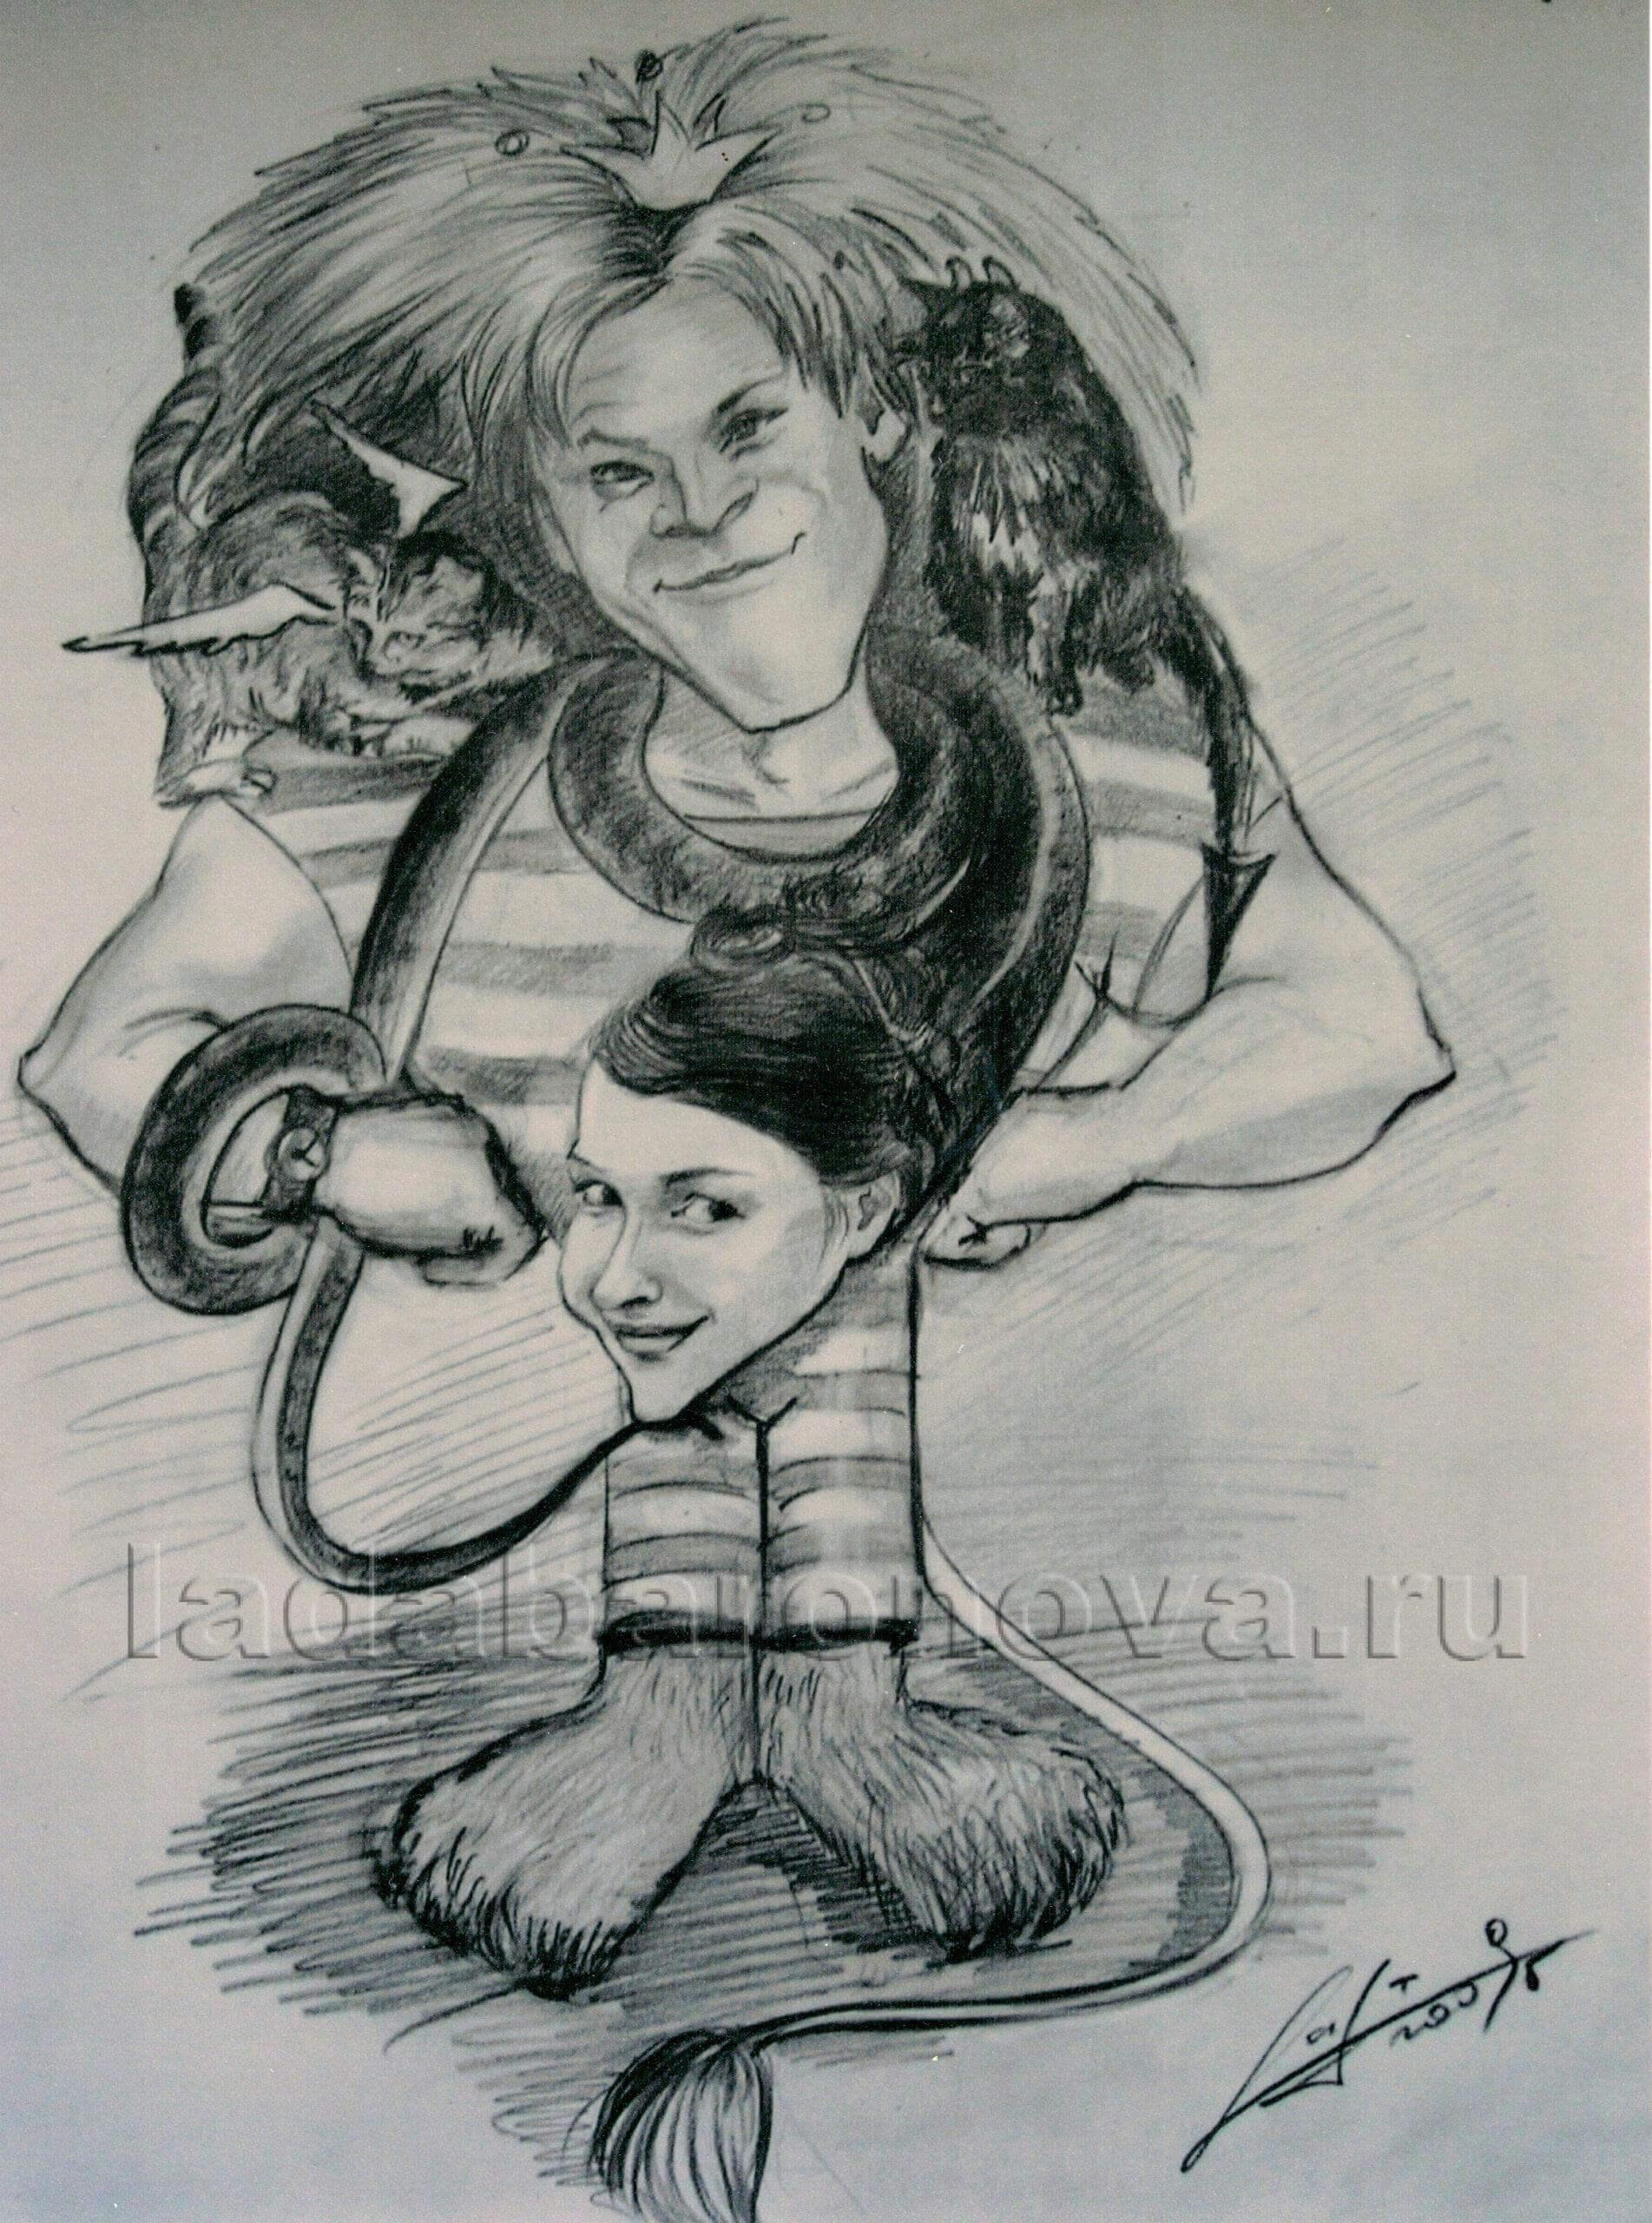 Шарж на супругов «Муж-лев, жена-змея»